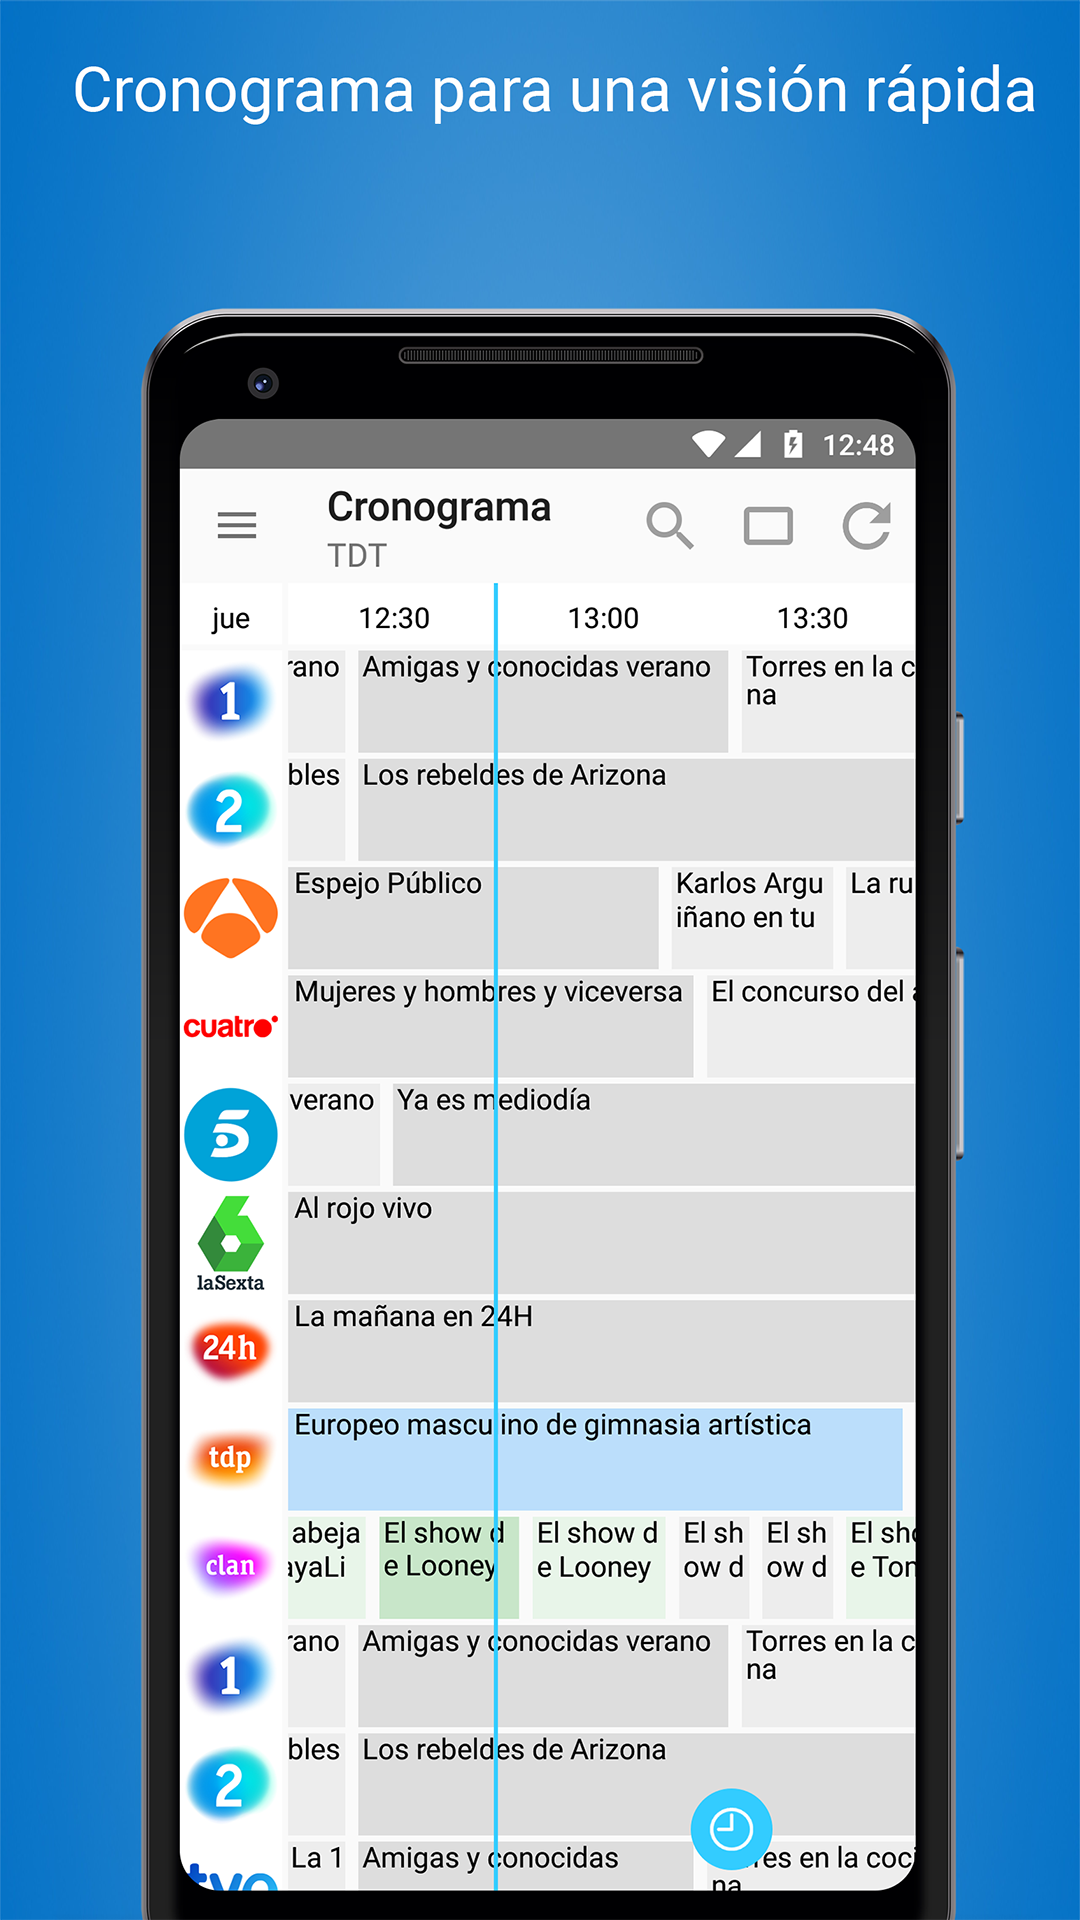 Programación TV España - Cisana TV+: Amazon.es: Appstore para Android